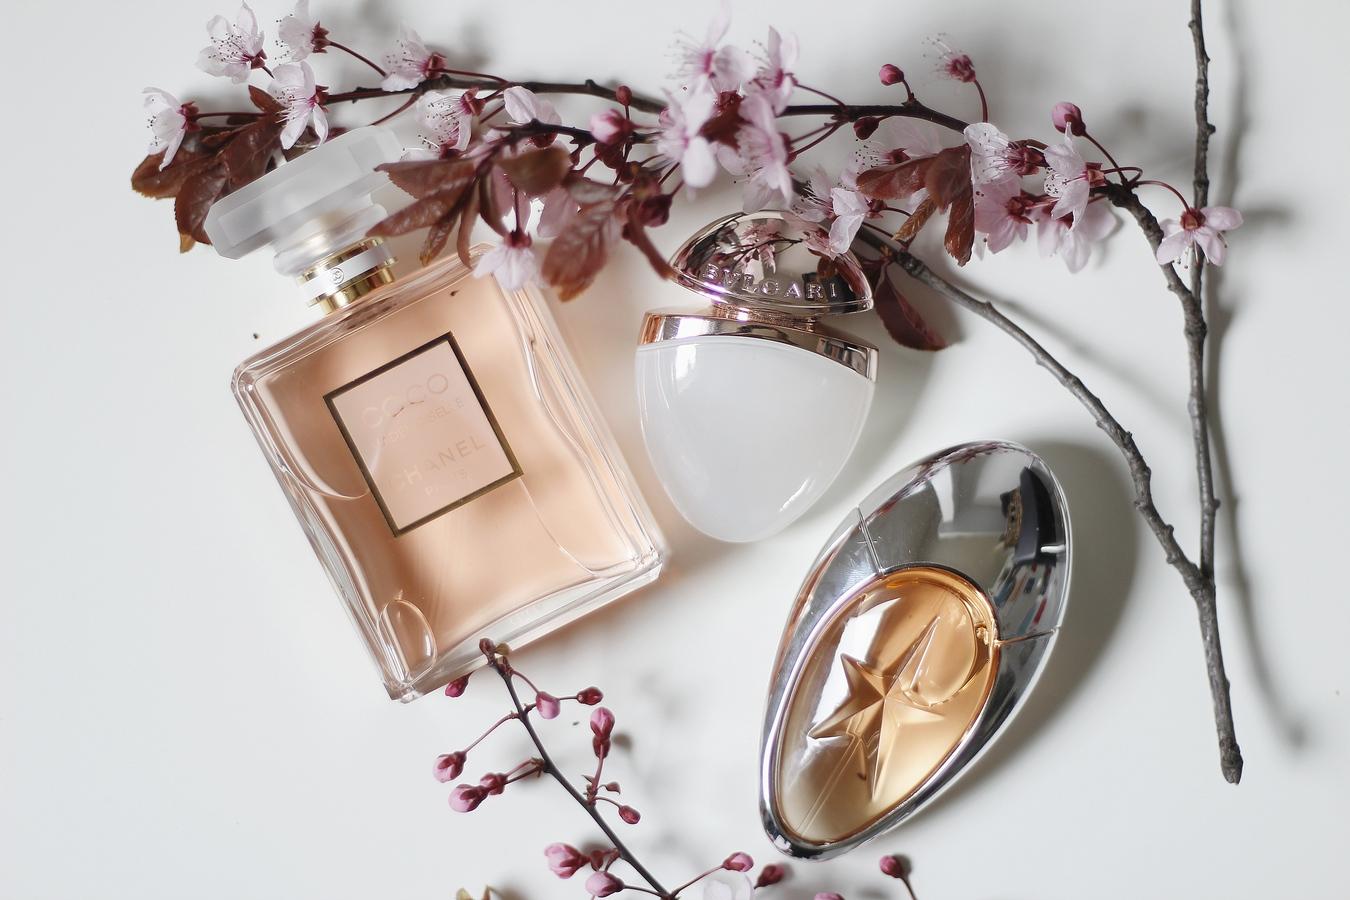 parfums femme - angel muse - coco mademoiselle - omnia crystalline